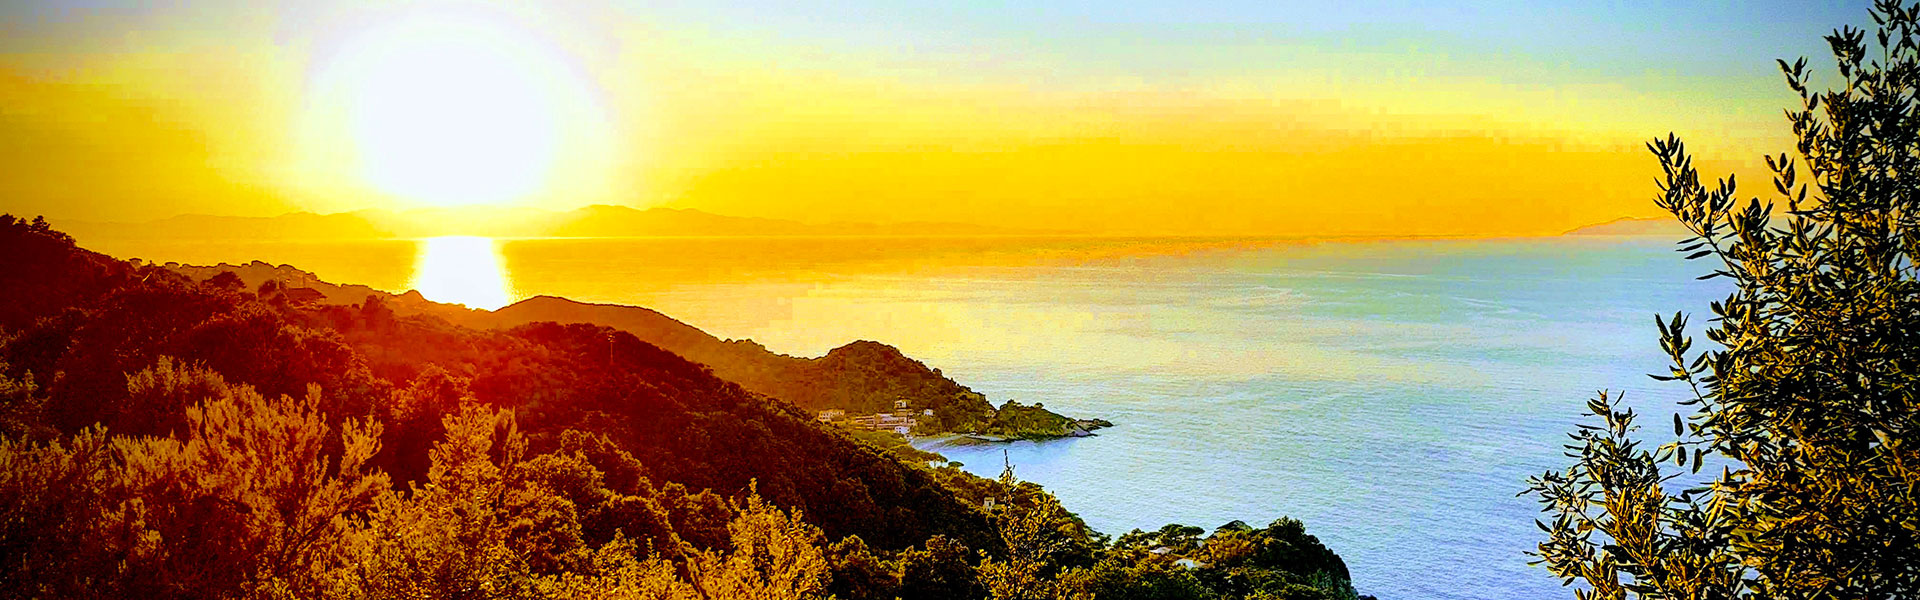 Tramonto Isola d'Elba